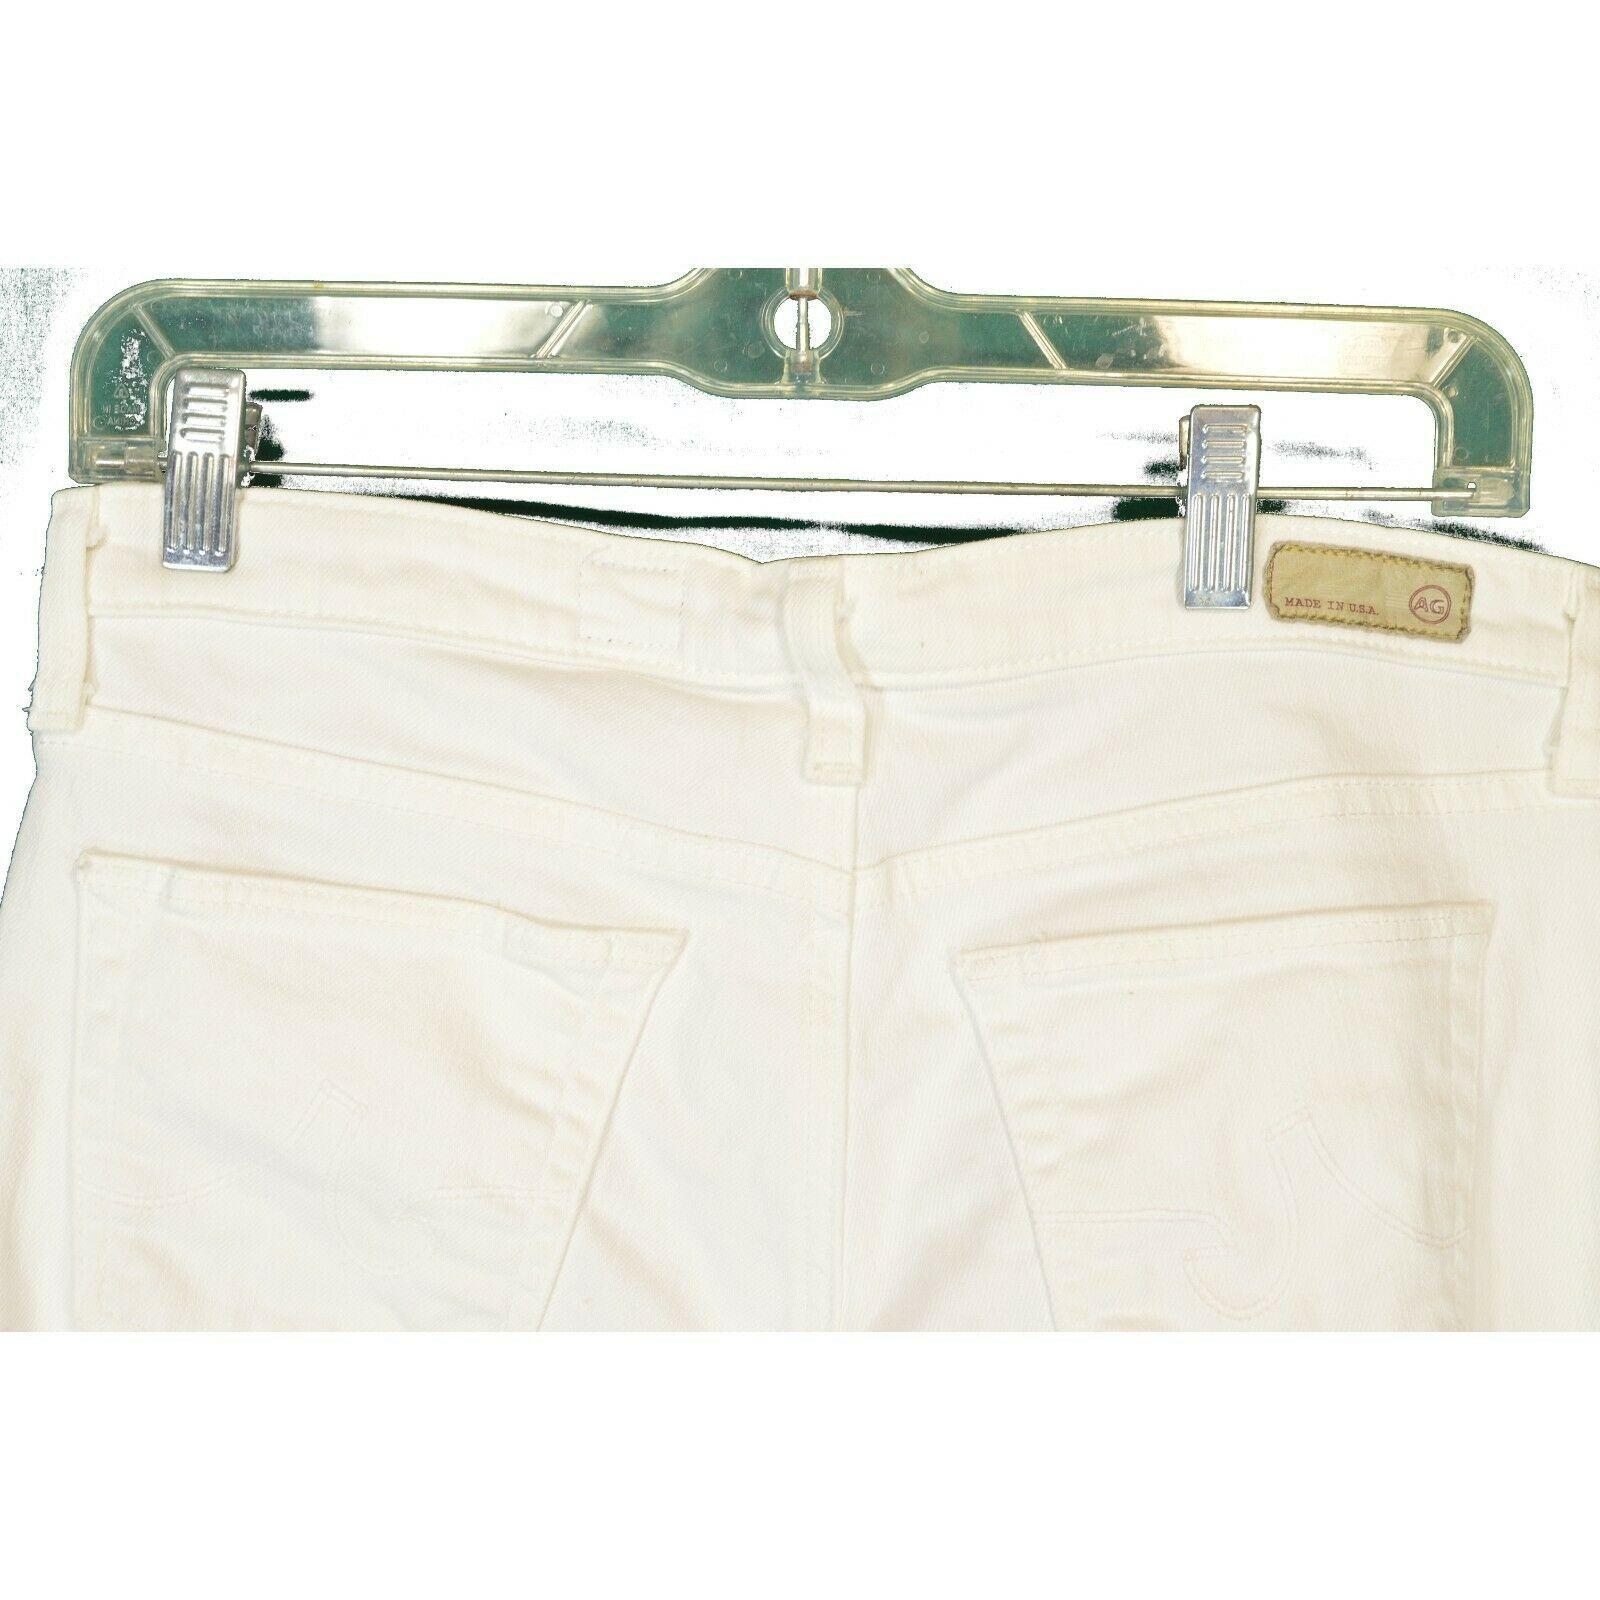 AG Adriano Goldschmied jeans 29 x 31 Stilt cigarette leg White thick EUCUSA image 4